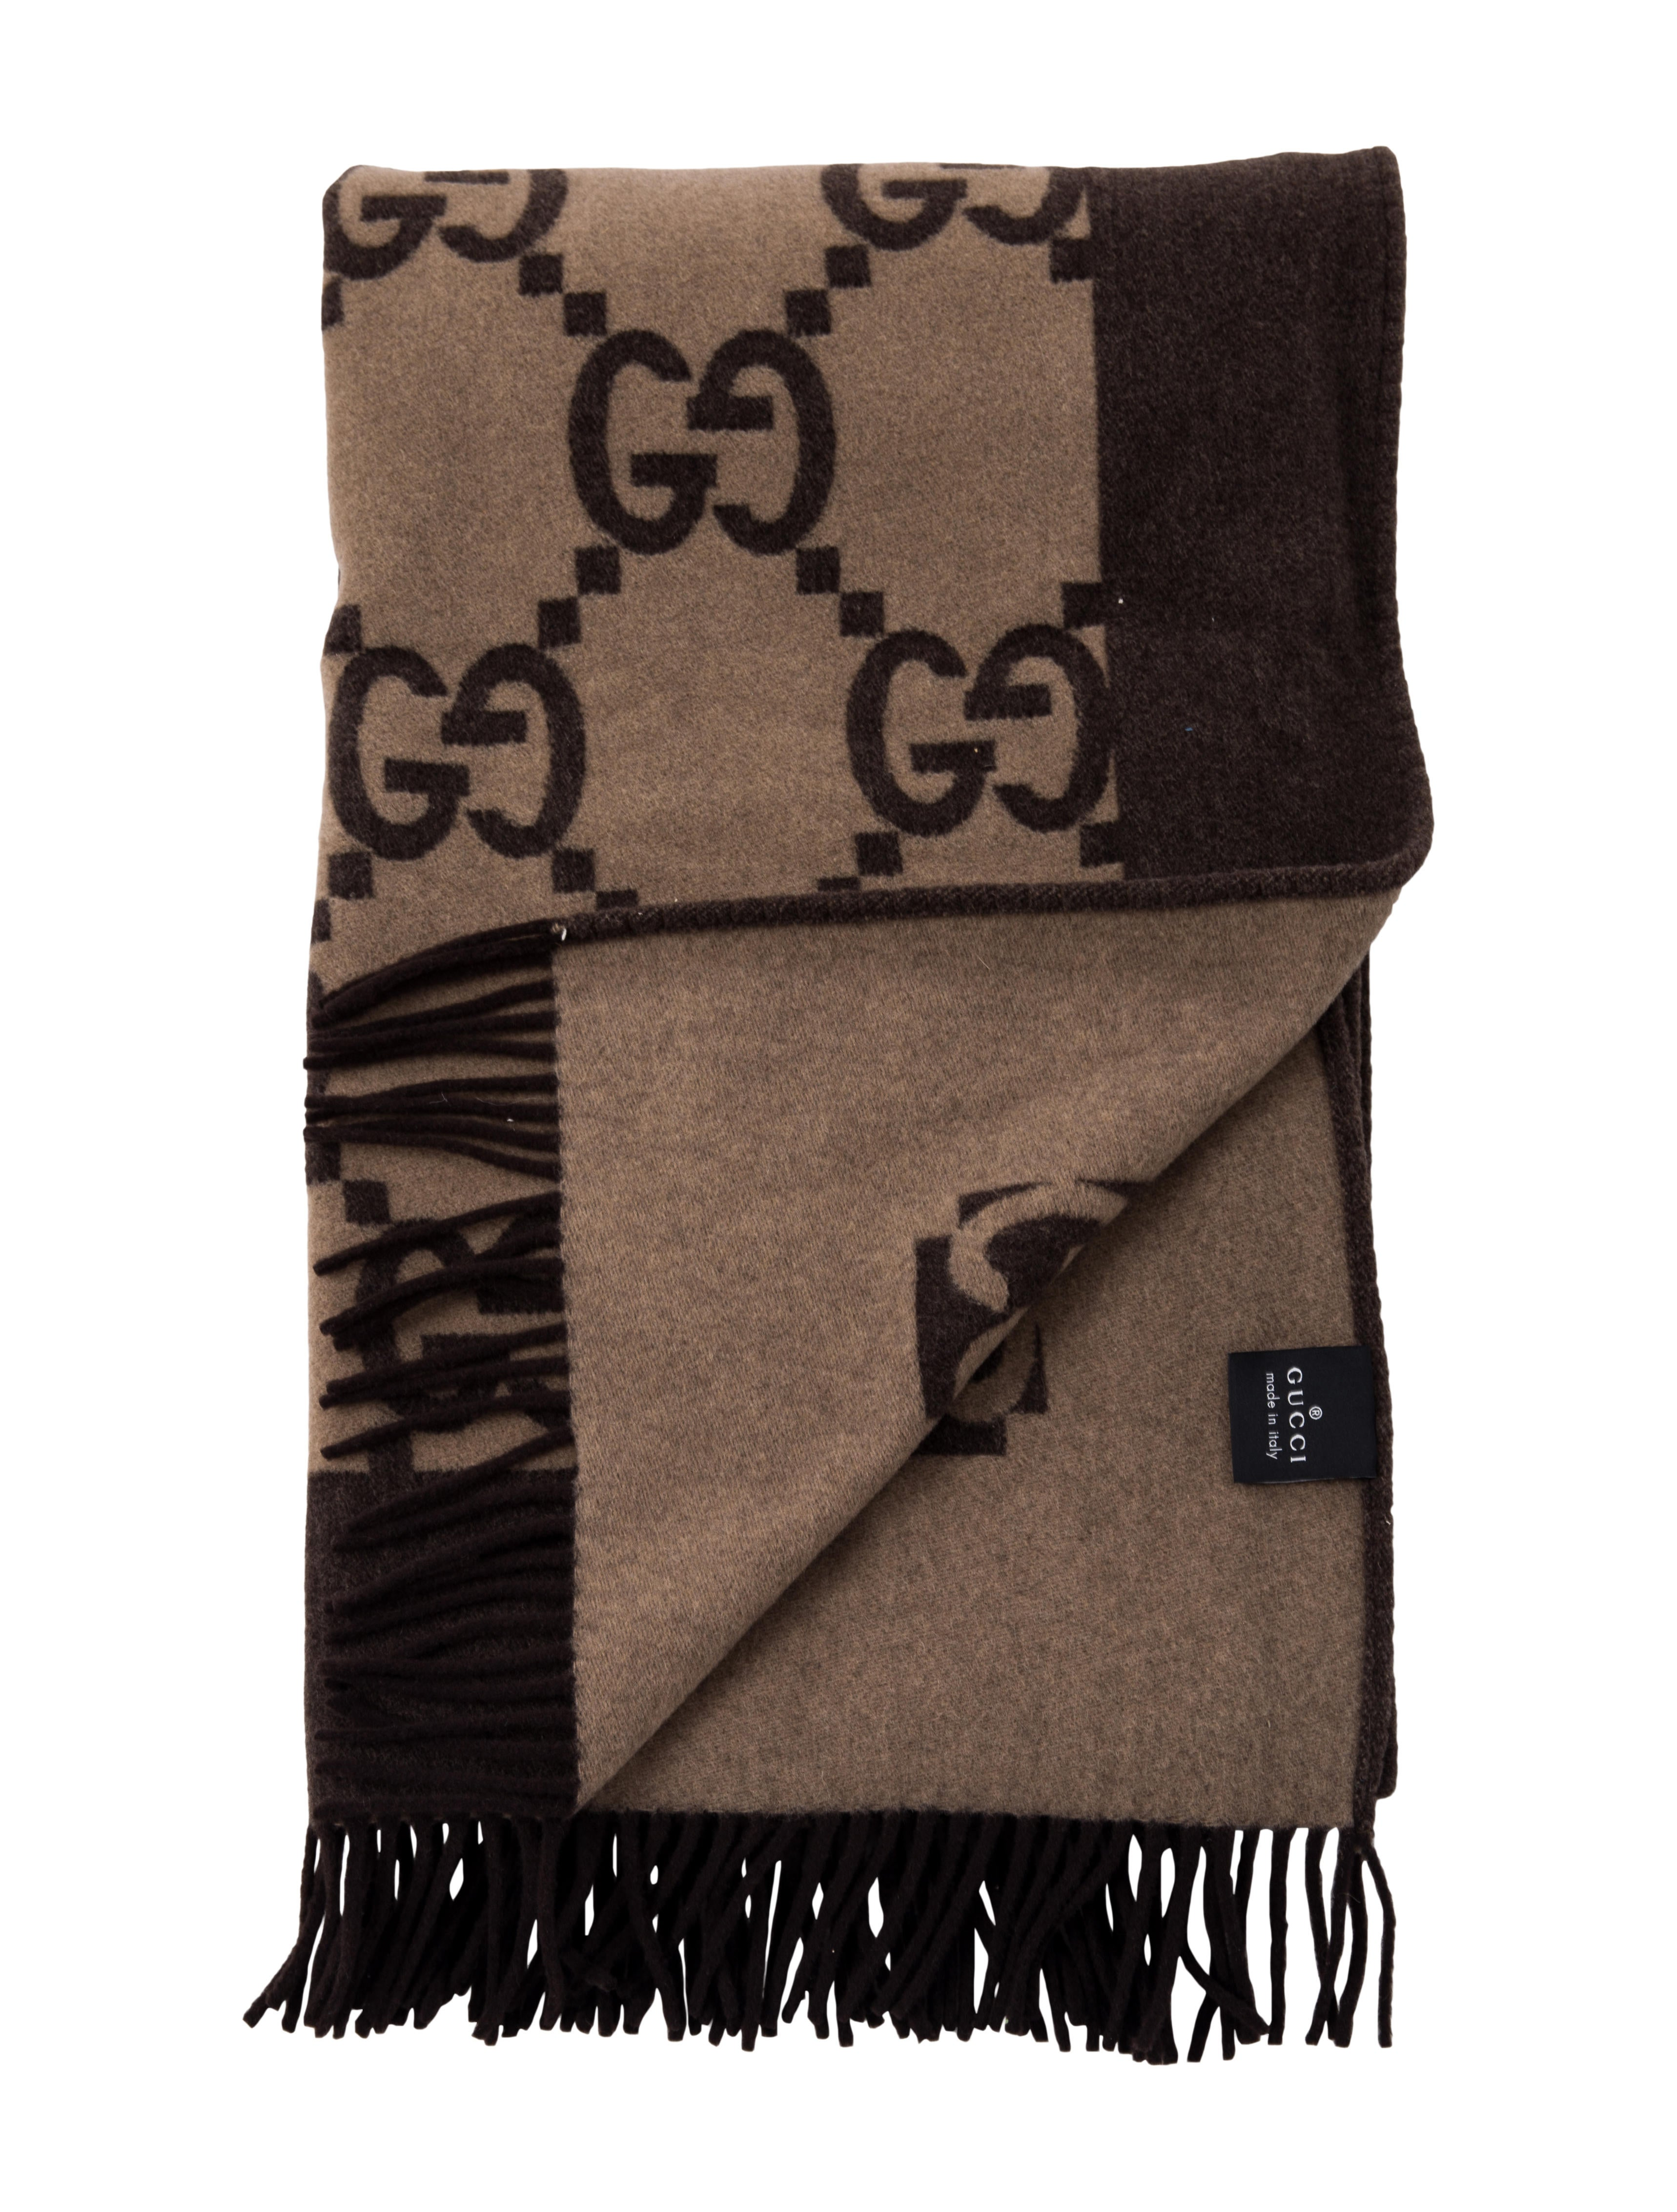 a139adf413d Gucci Blanket Fake Crochet Ideas 2019. Gucci Blanket Replica 2019  Inspirational Throw Blankets